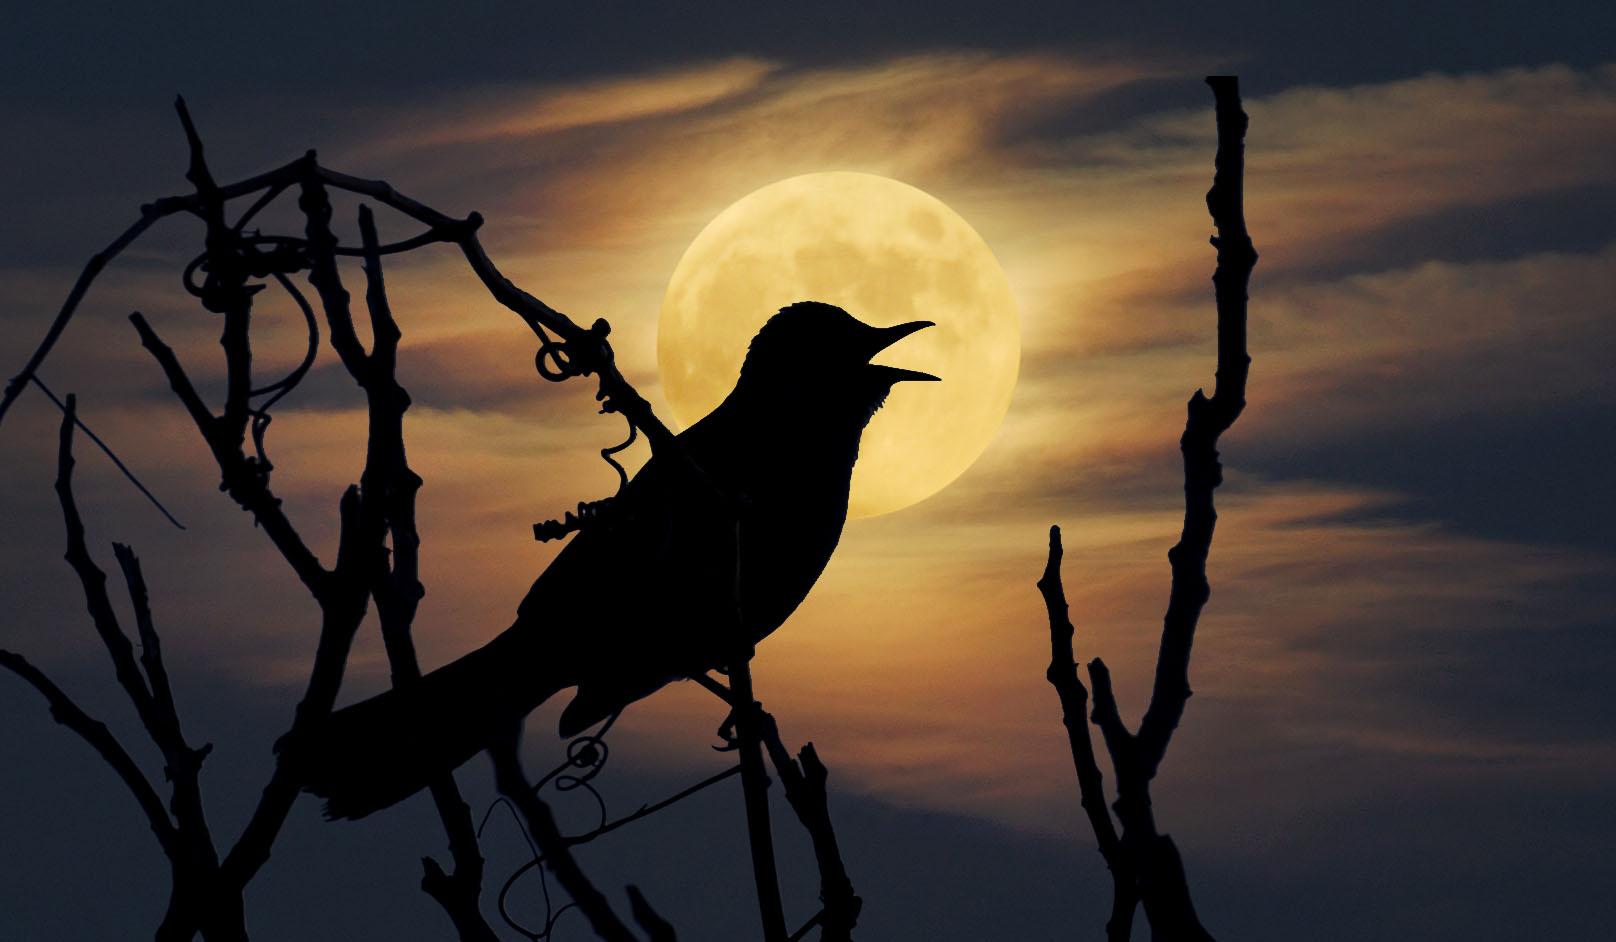 Gray Catbird silhouette and moon overlay © Lang Elliott